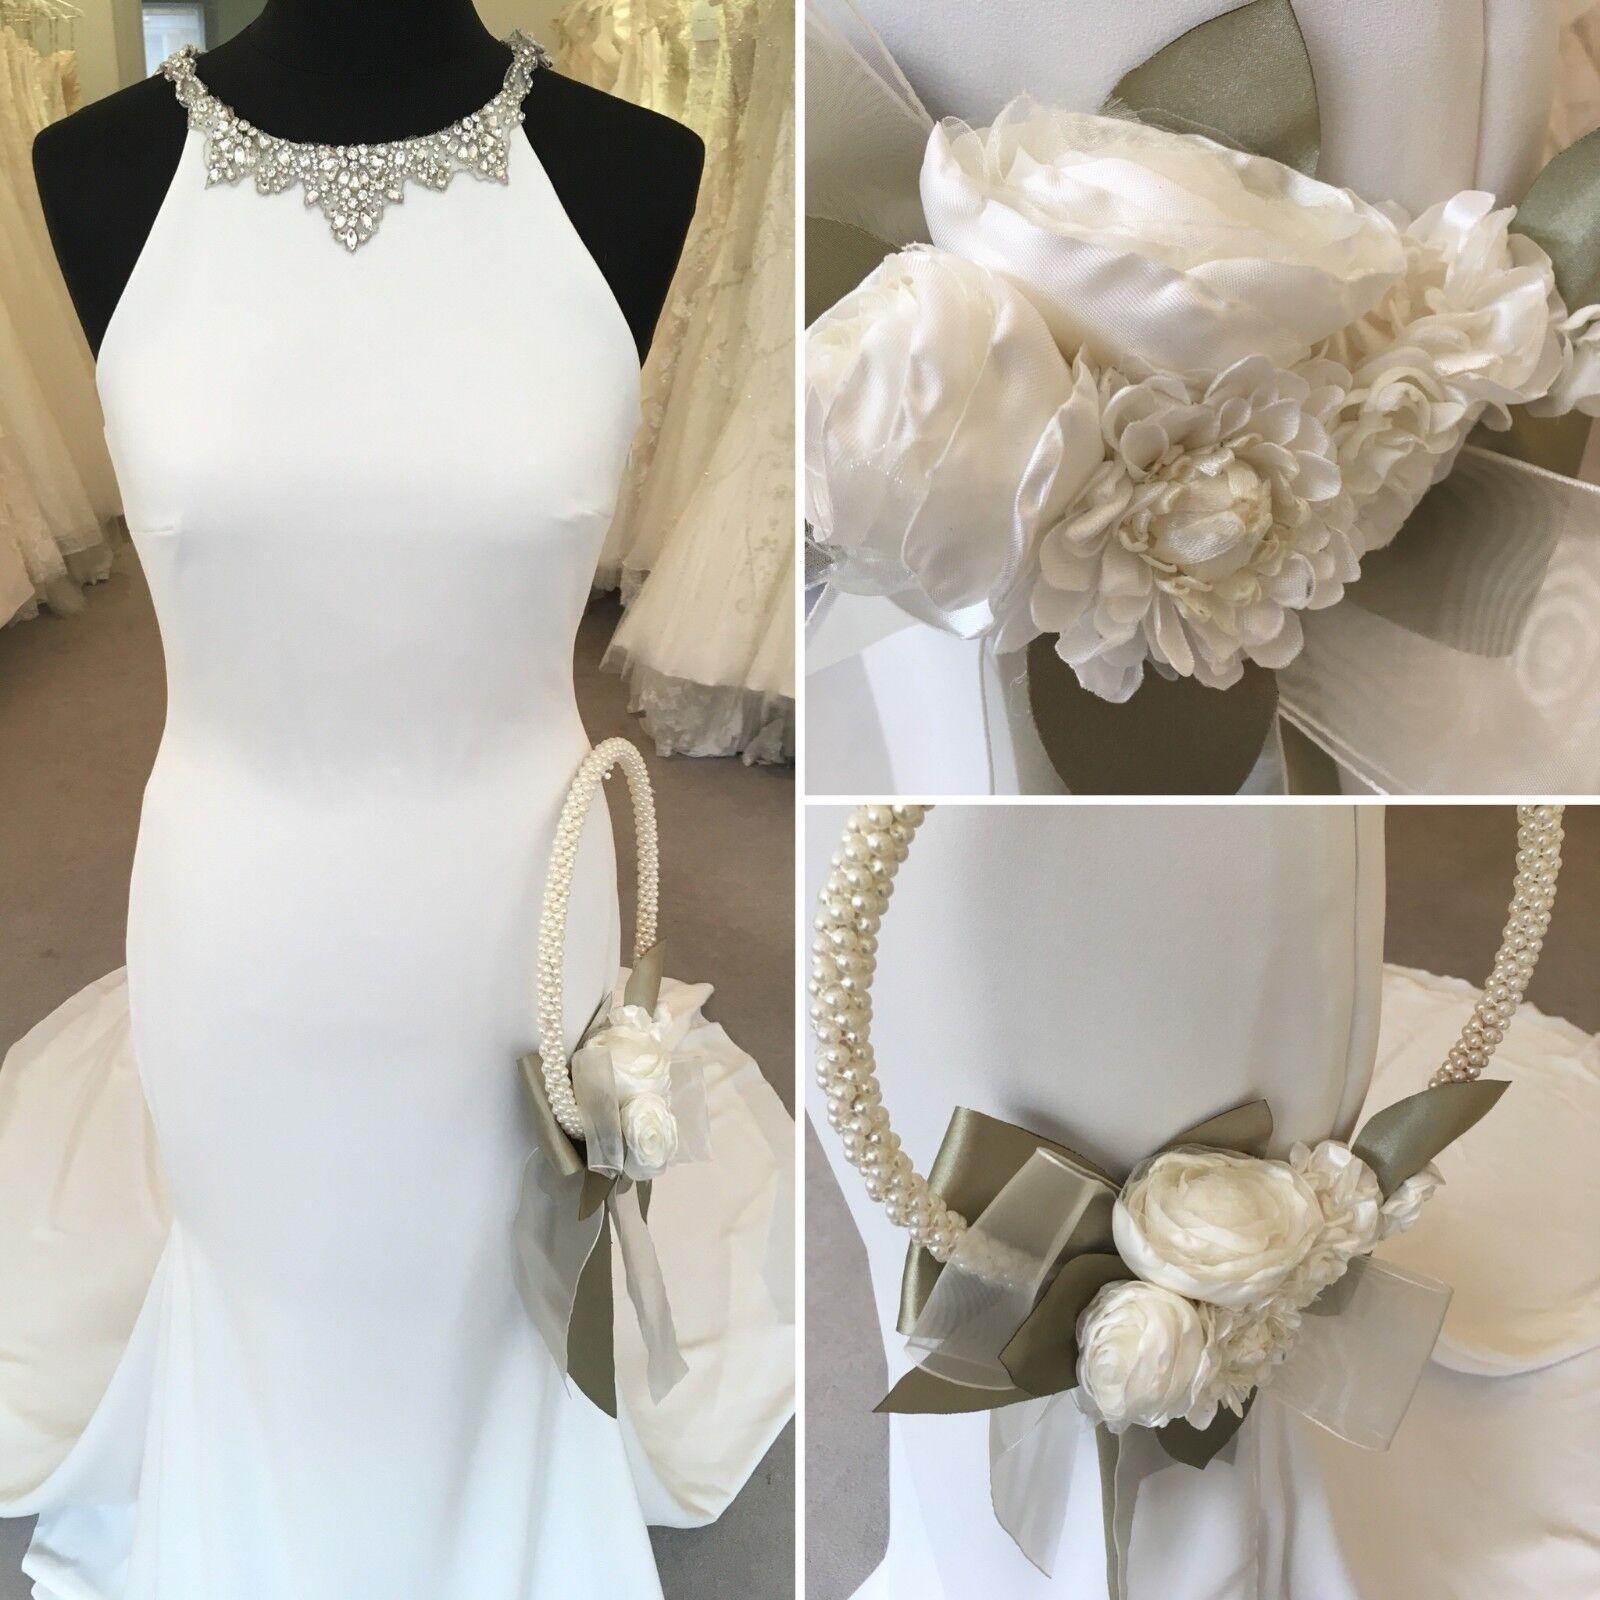 Wedding Bridal Bouquet Hoop - Ivory Satin & Organza Flowers Unique Handmade